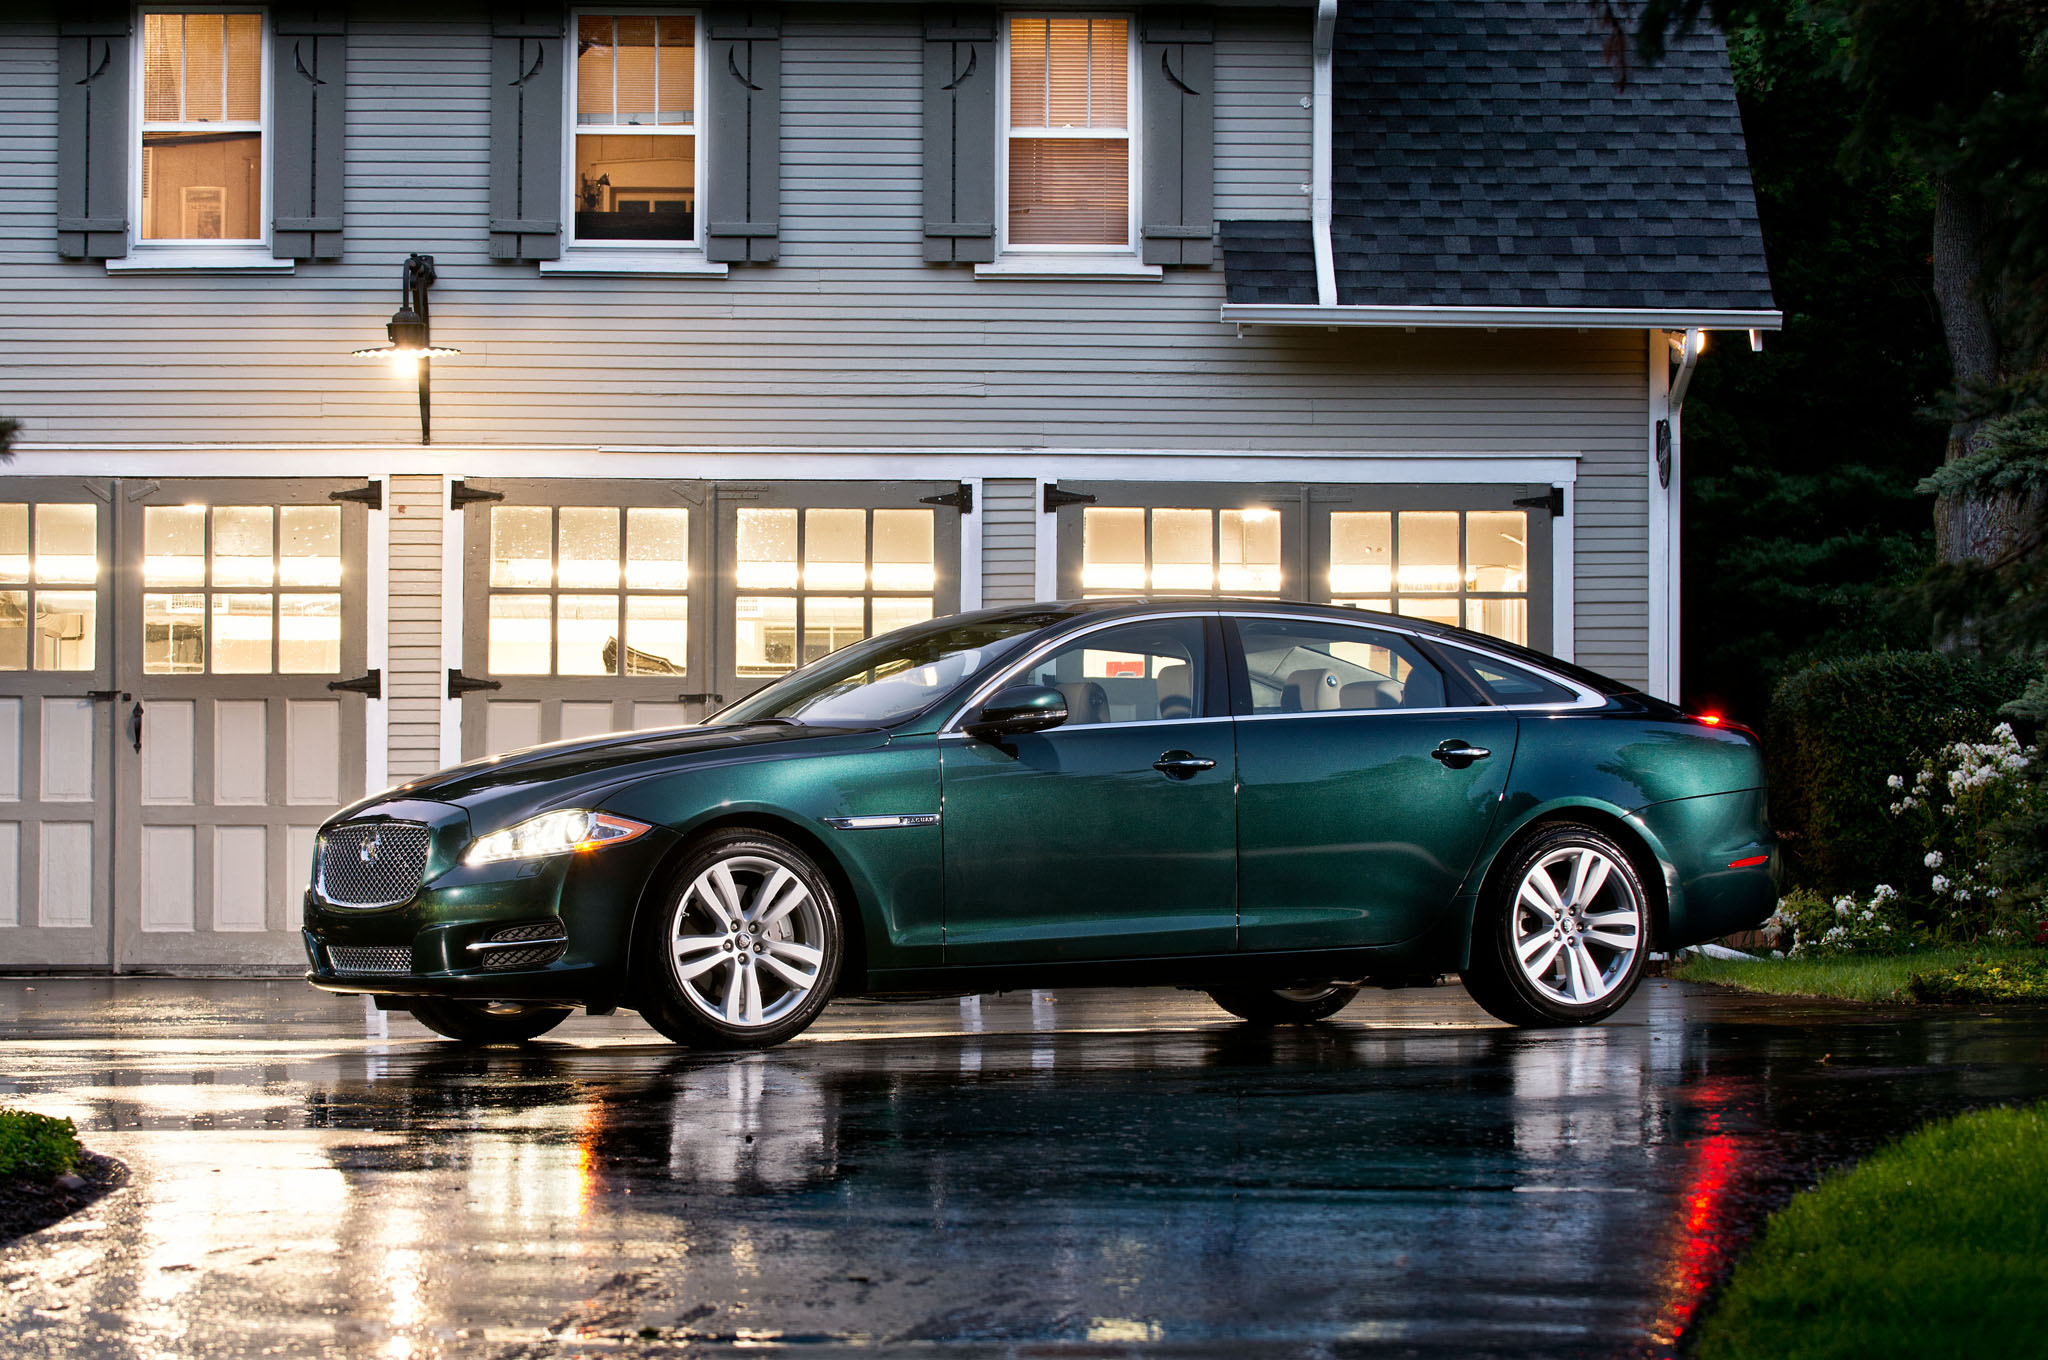 2013 Jaguar XJL Profile View Night1